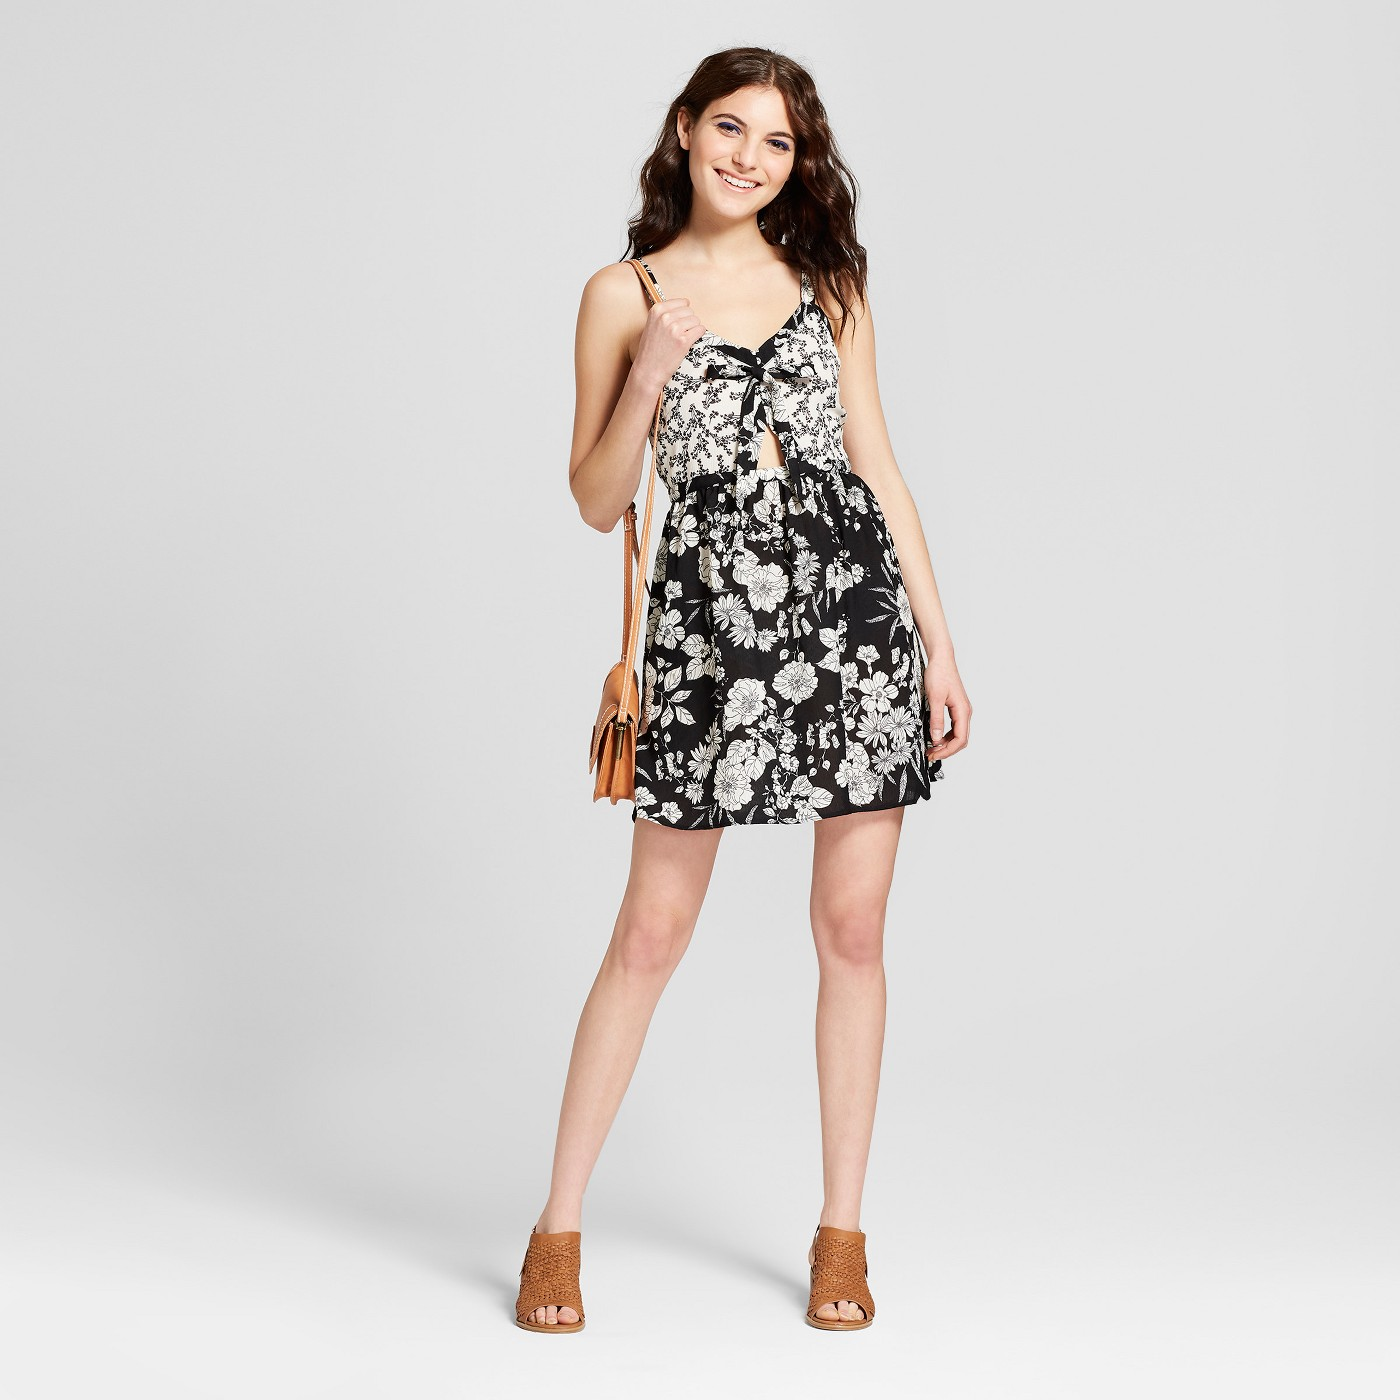 Copy of Floral Women's Strappy Xhilaration Dress